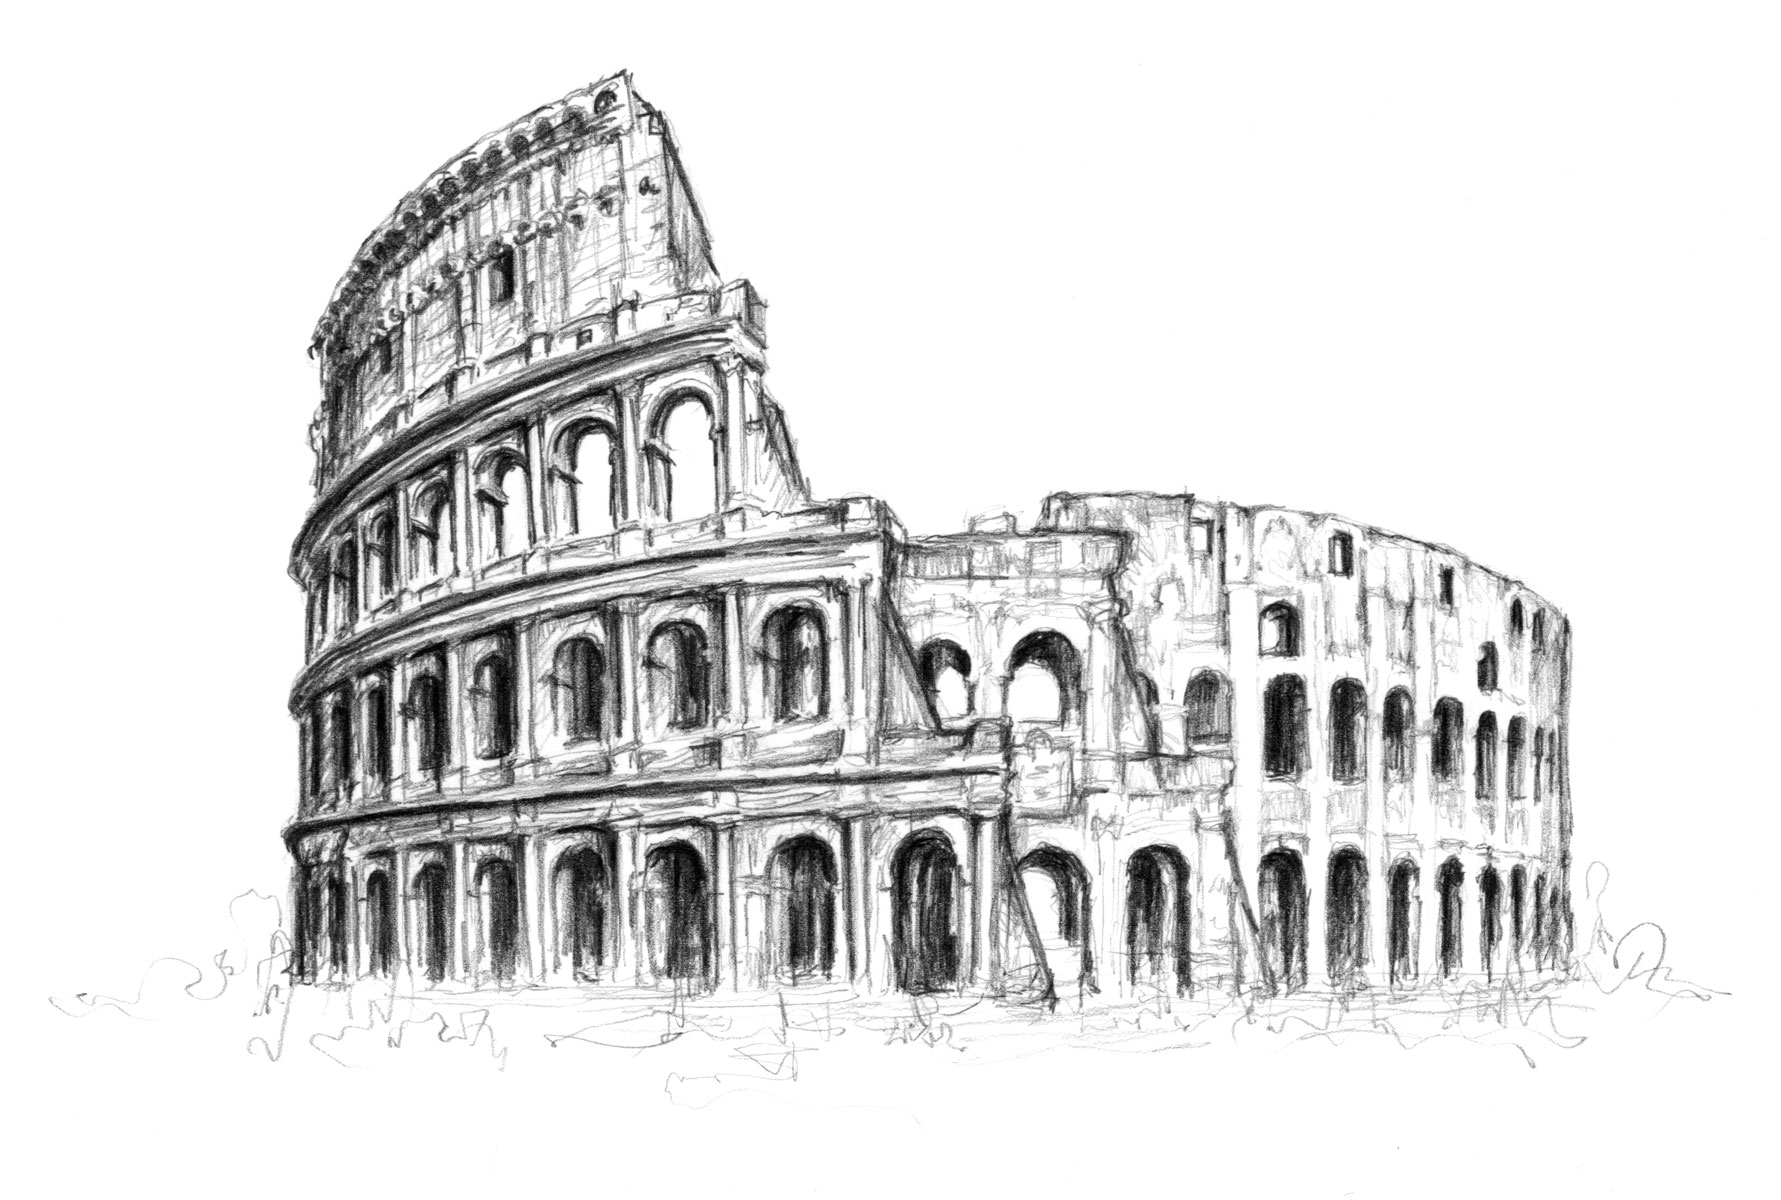 IT-Rome-colosseum02.jpg